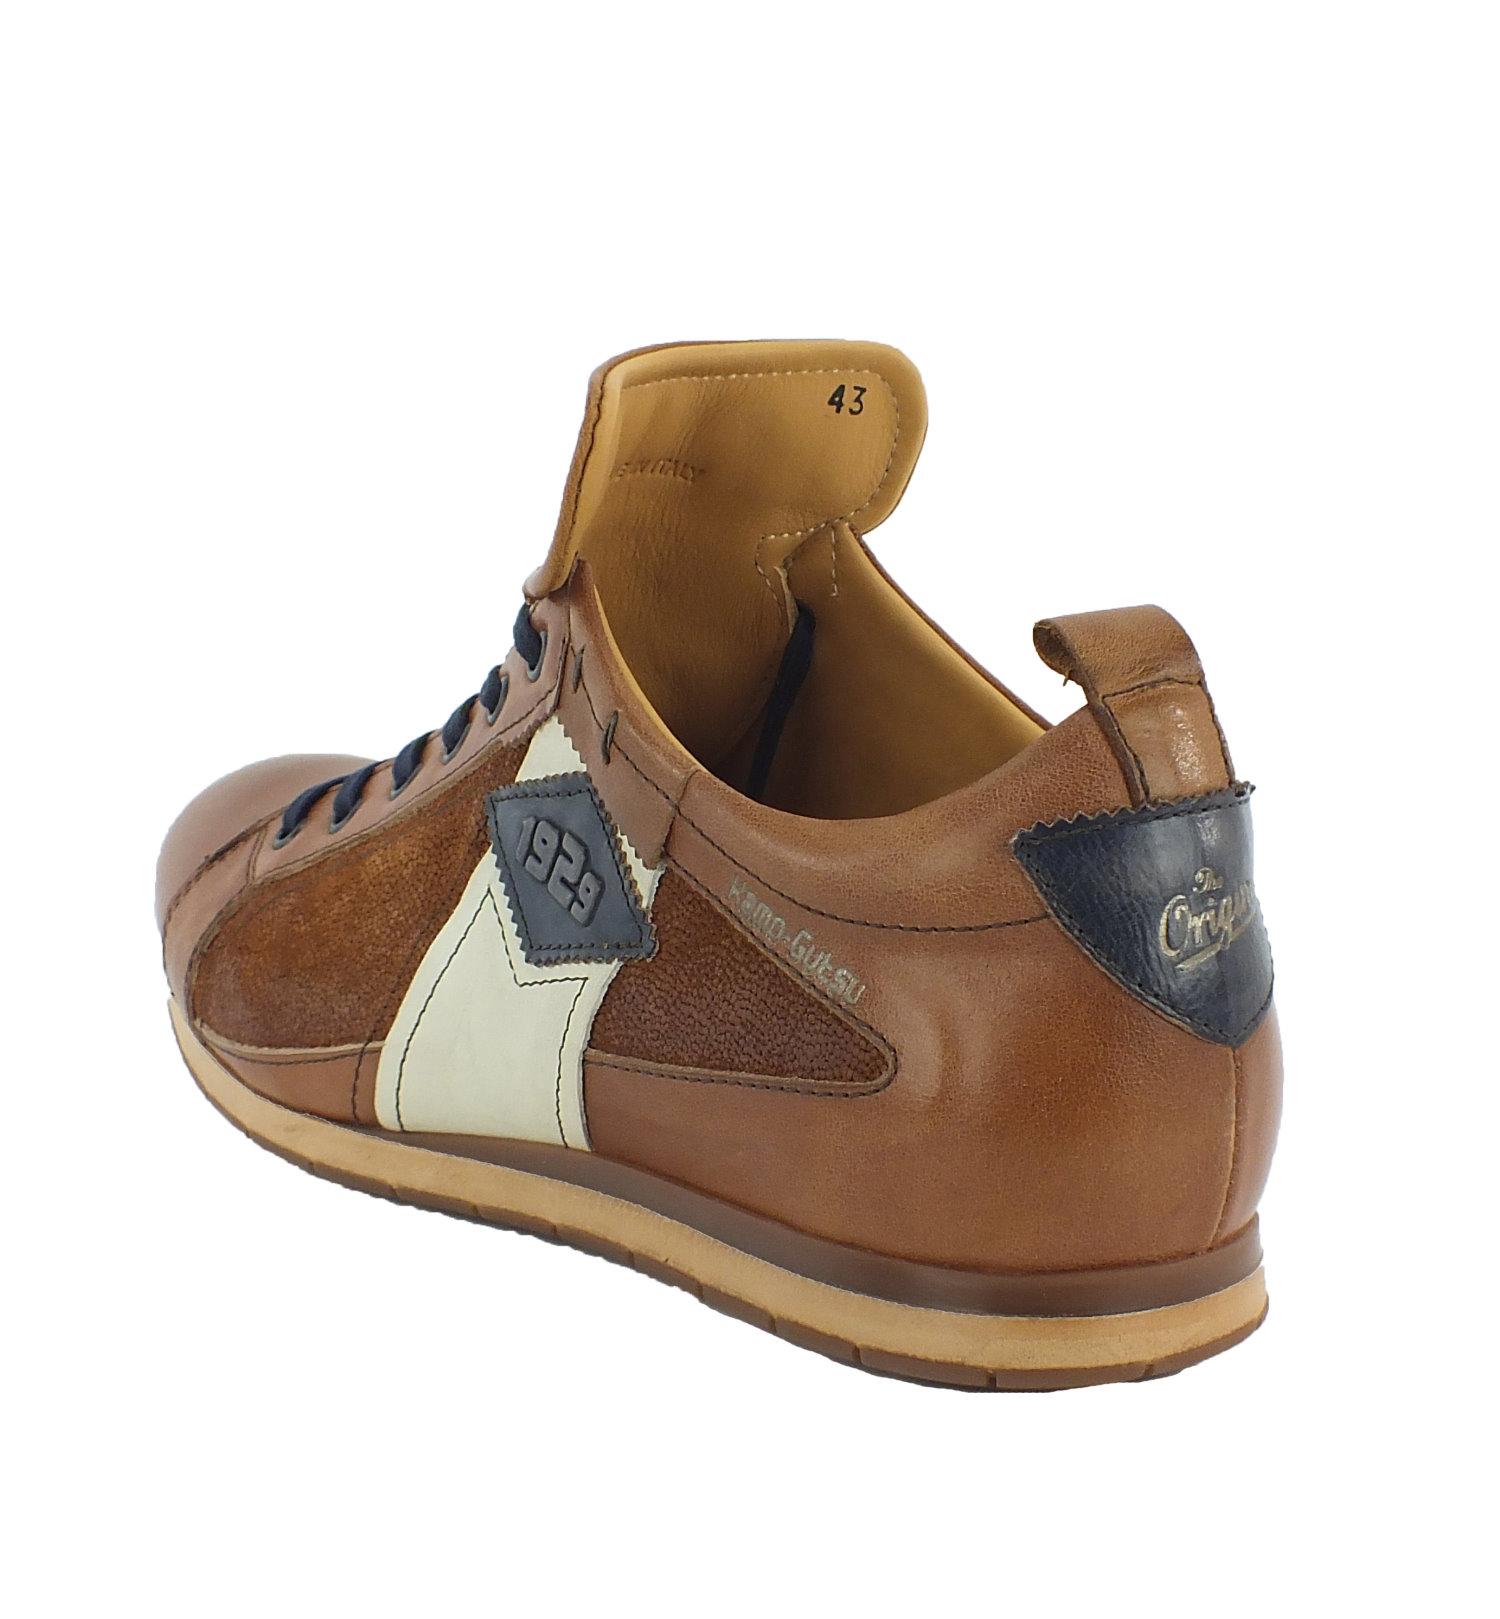 Kamo-Gutsu Herren Leder Schnürer Sneaker Halbschuhe Schnürschuhe 10206